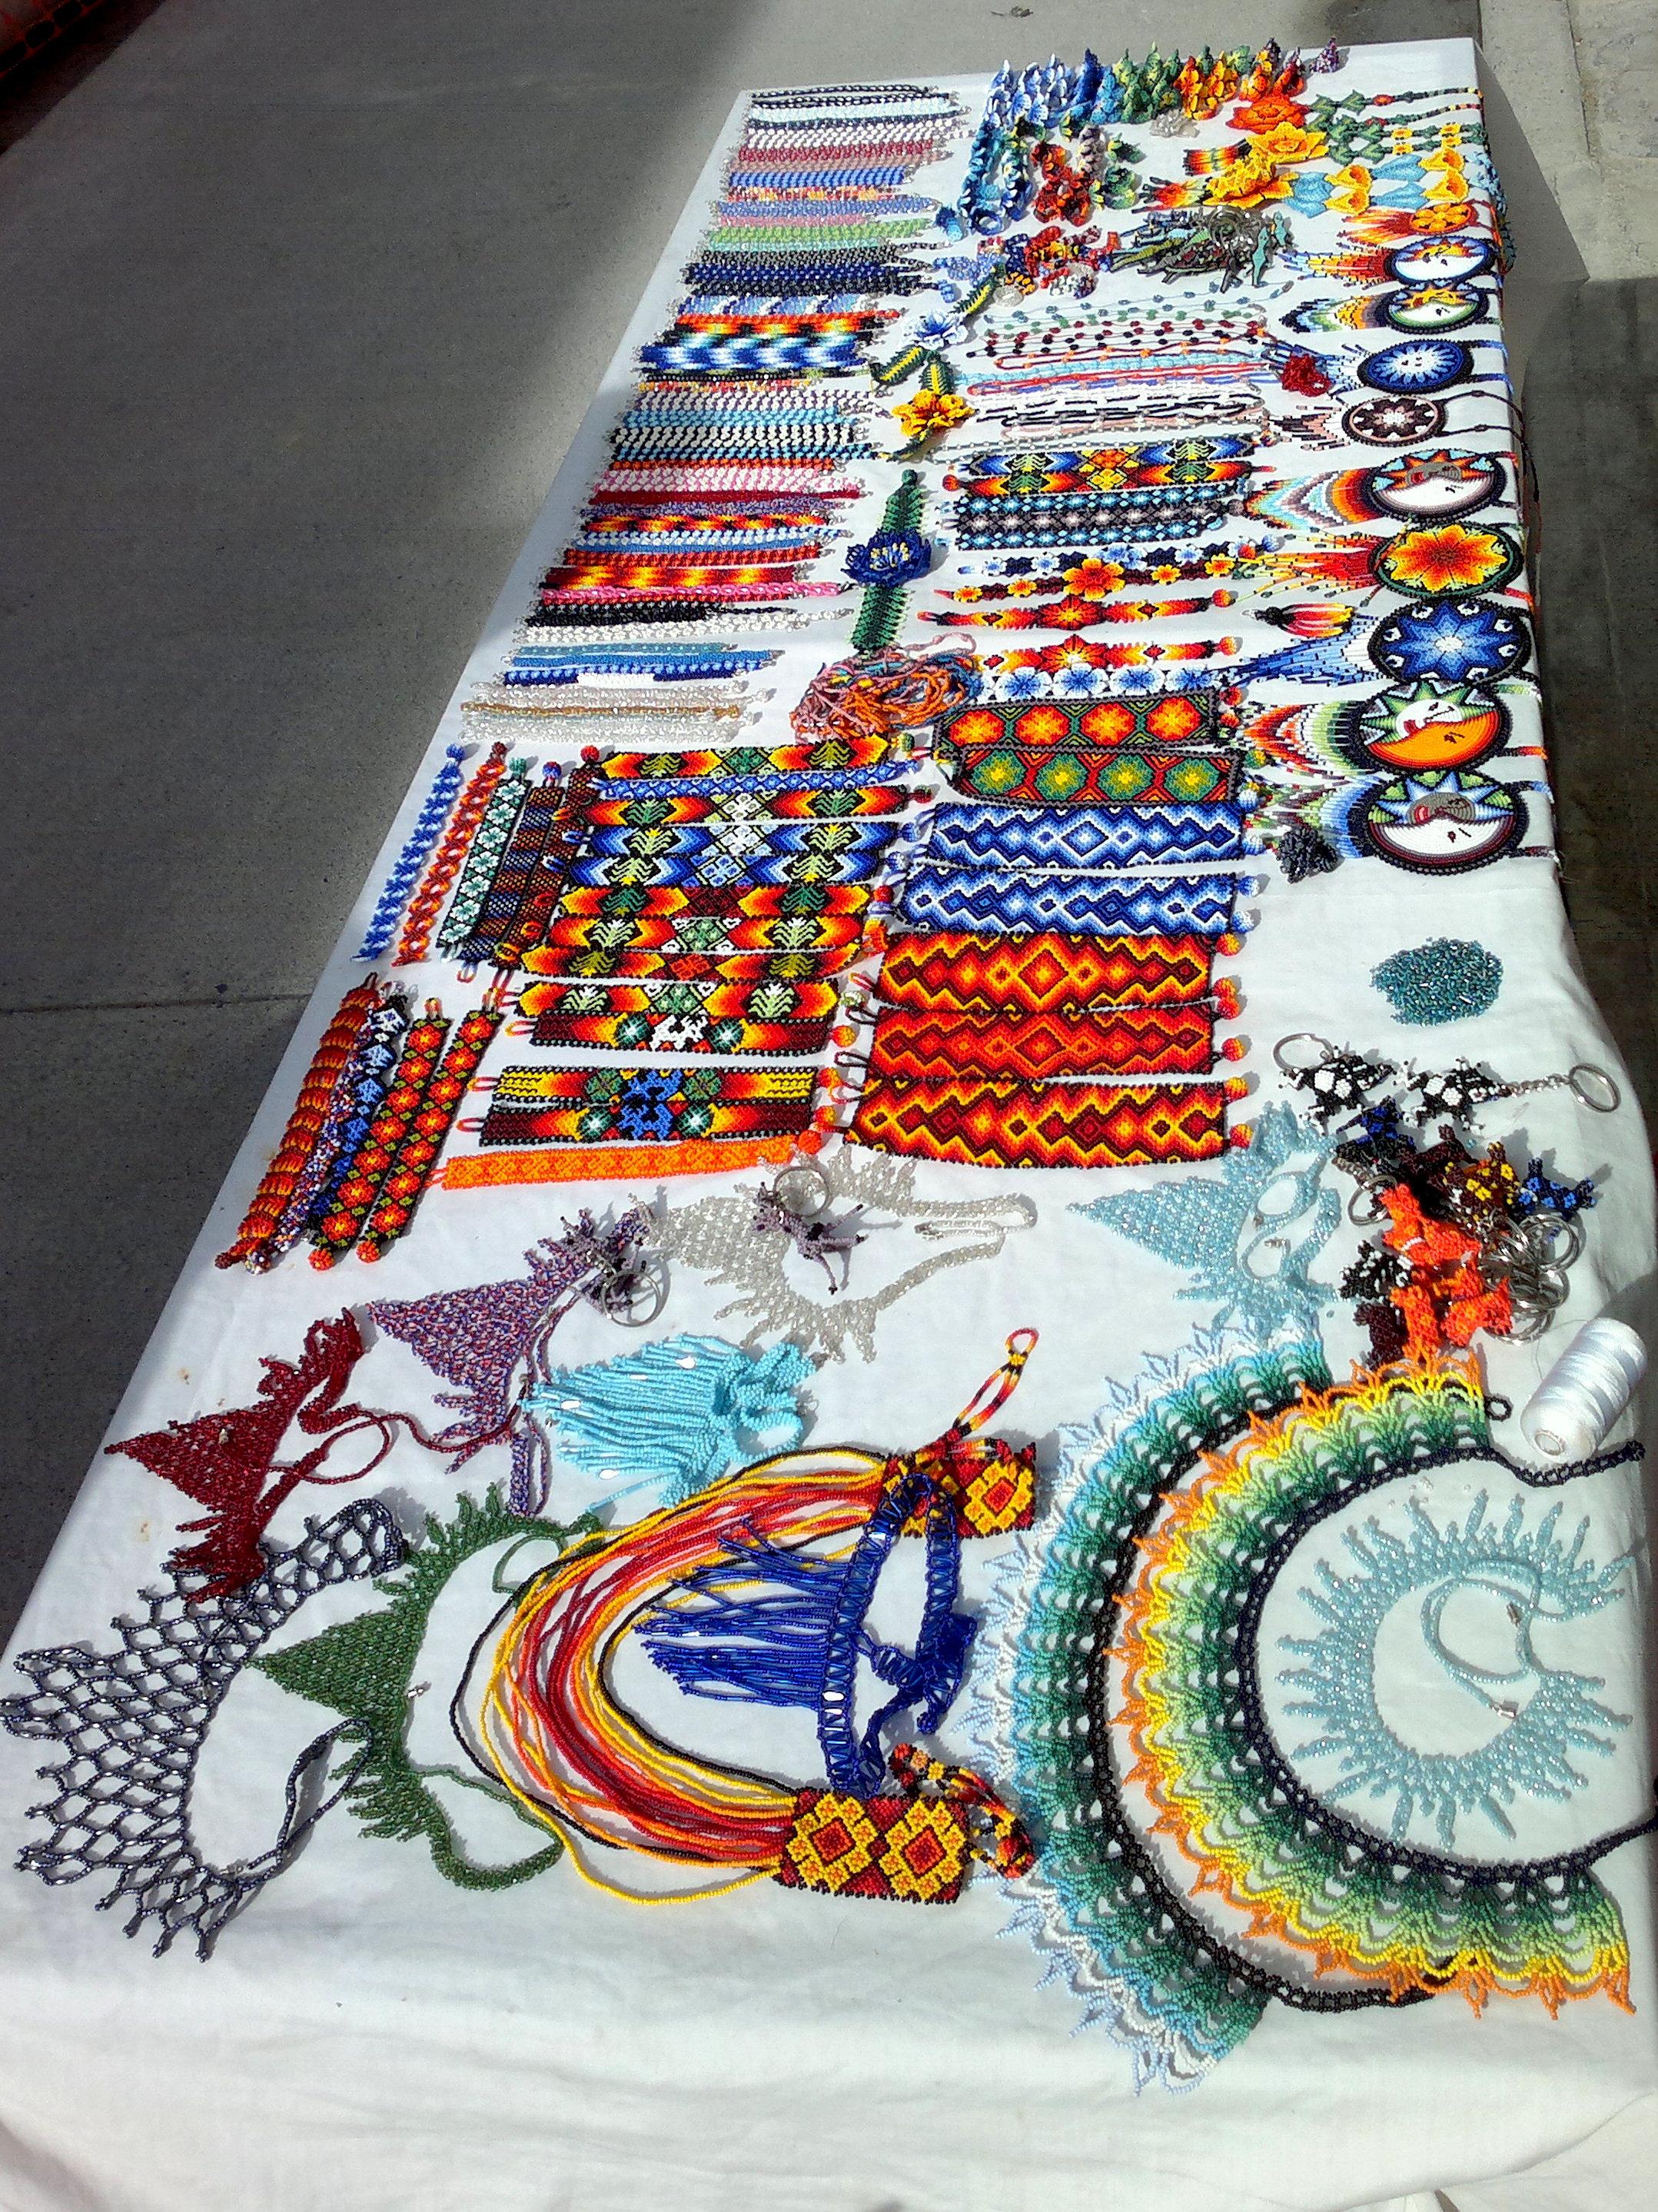 handmade crafts in a street market, Art, Crafts, Handmade, Market, HQ Photo